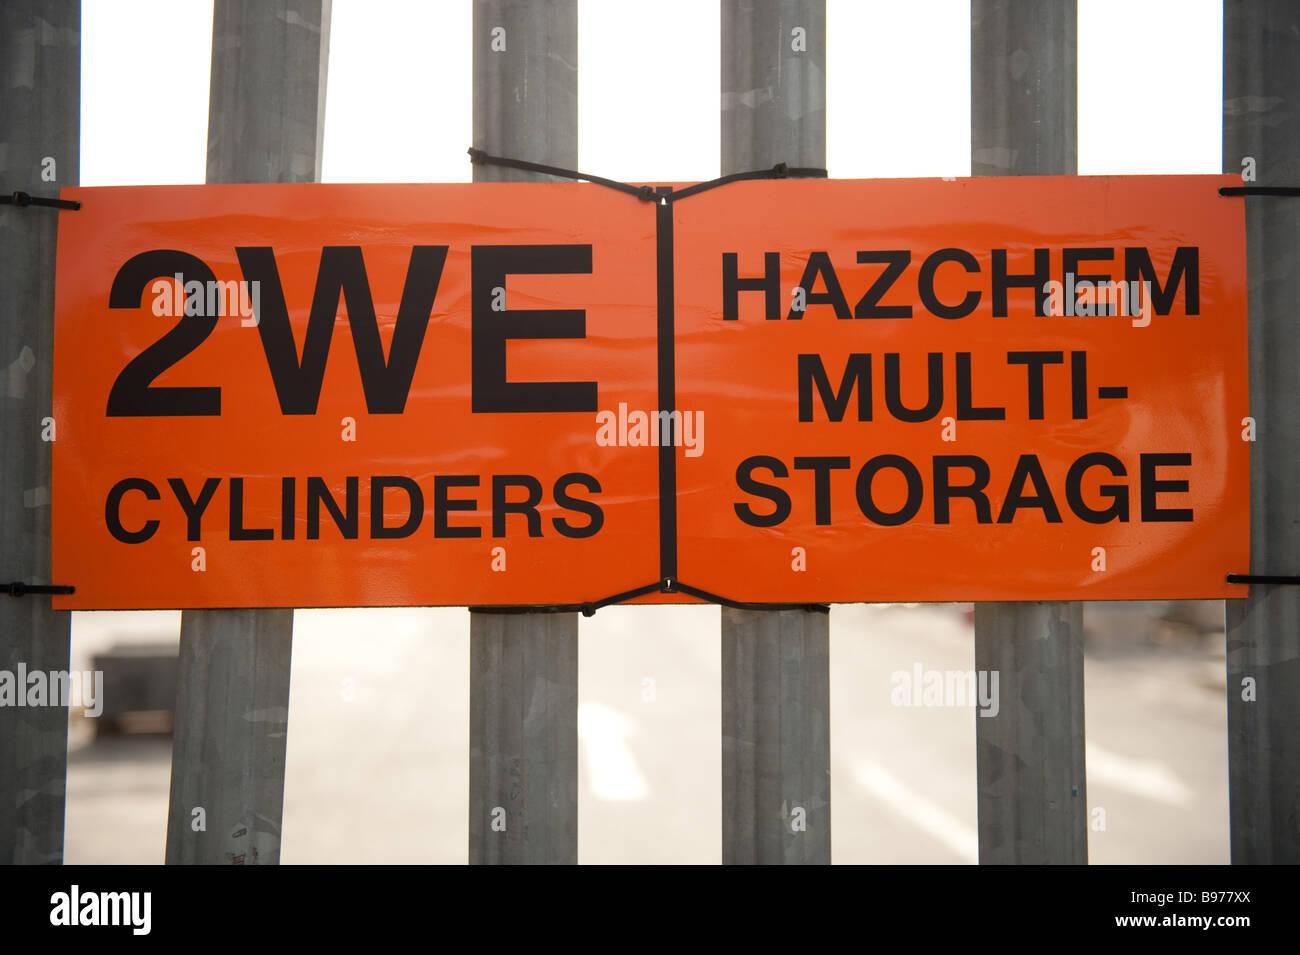 2WE Hazchem multi storage danger warning sign UK - Stock Image